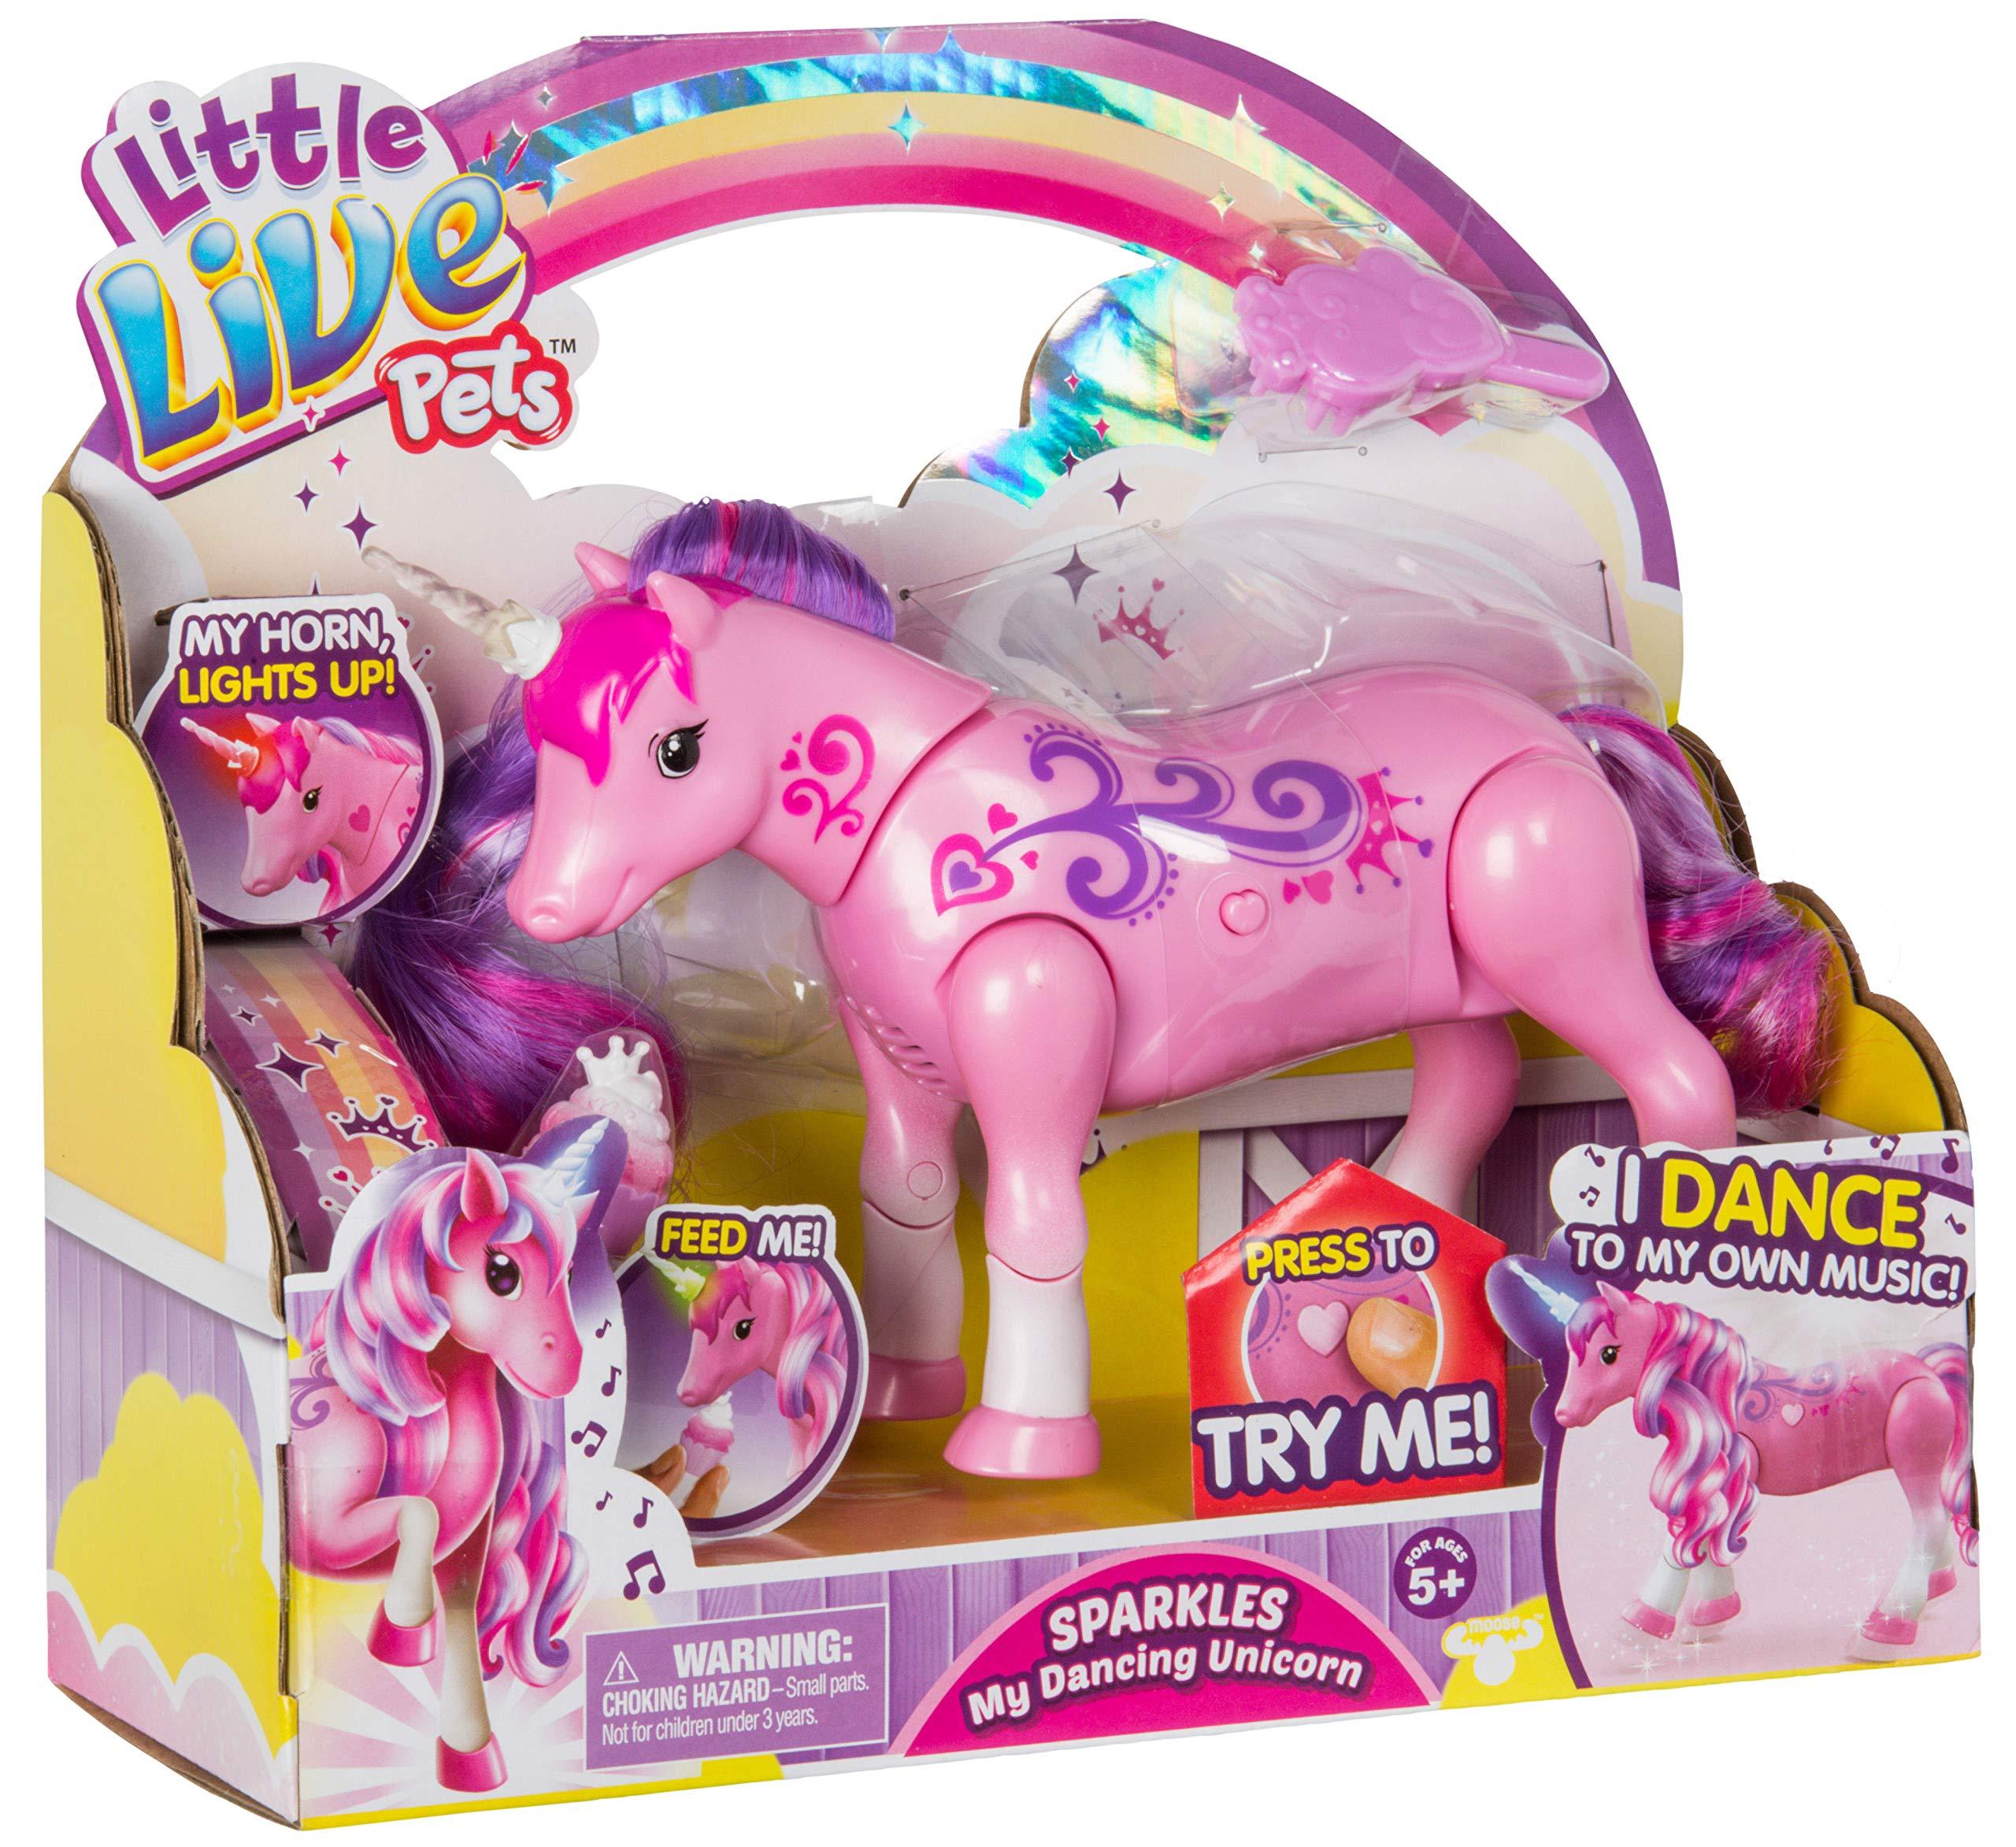 Little Live Pets - Sparkles My Dancing Interactive Unicorn   Dances & Lights to Music - Engaging Fun - Batteries… 19